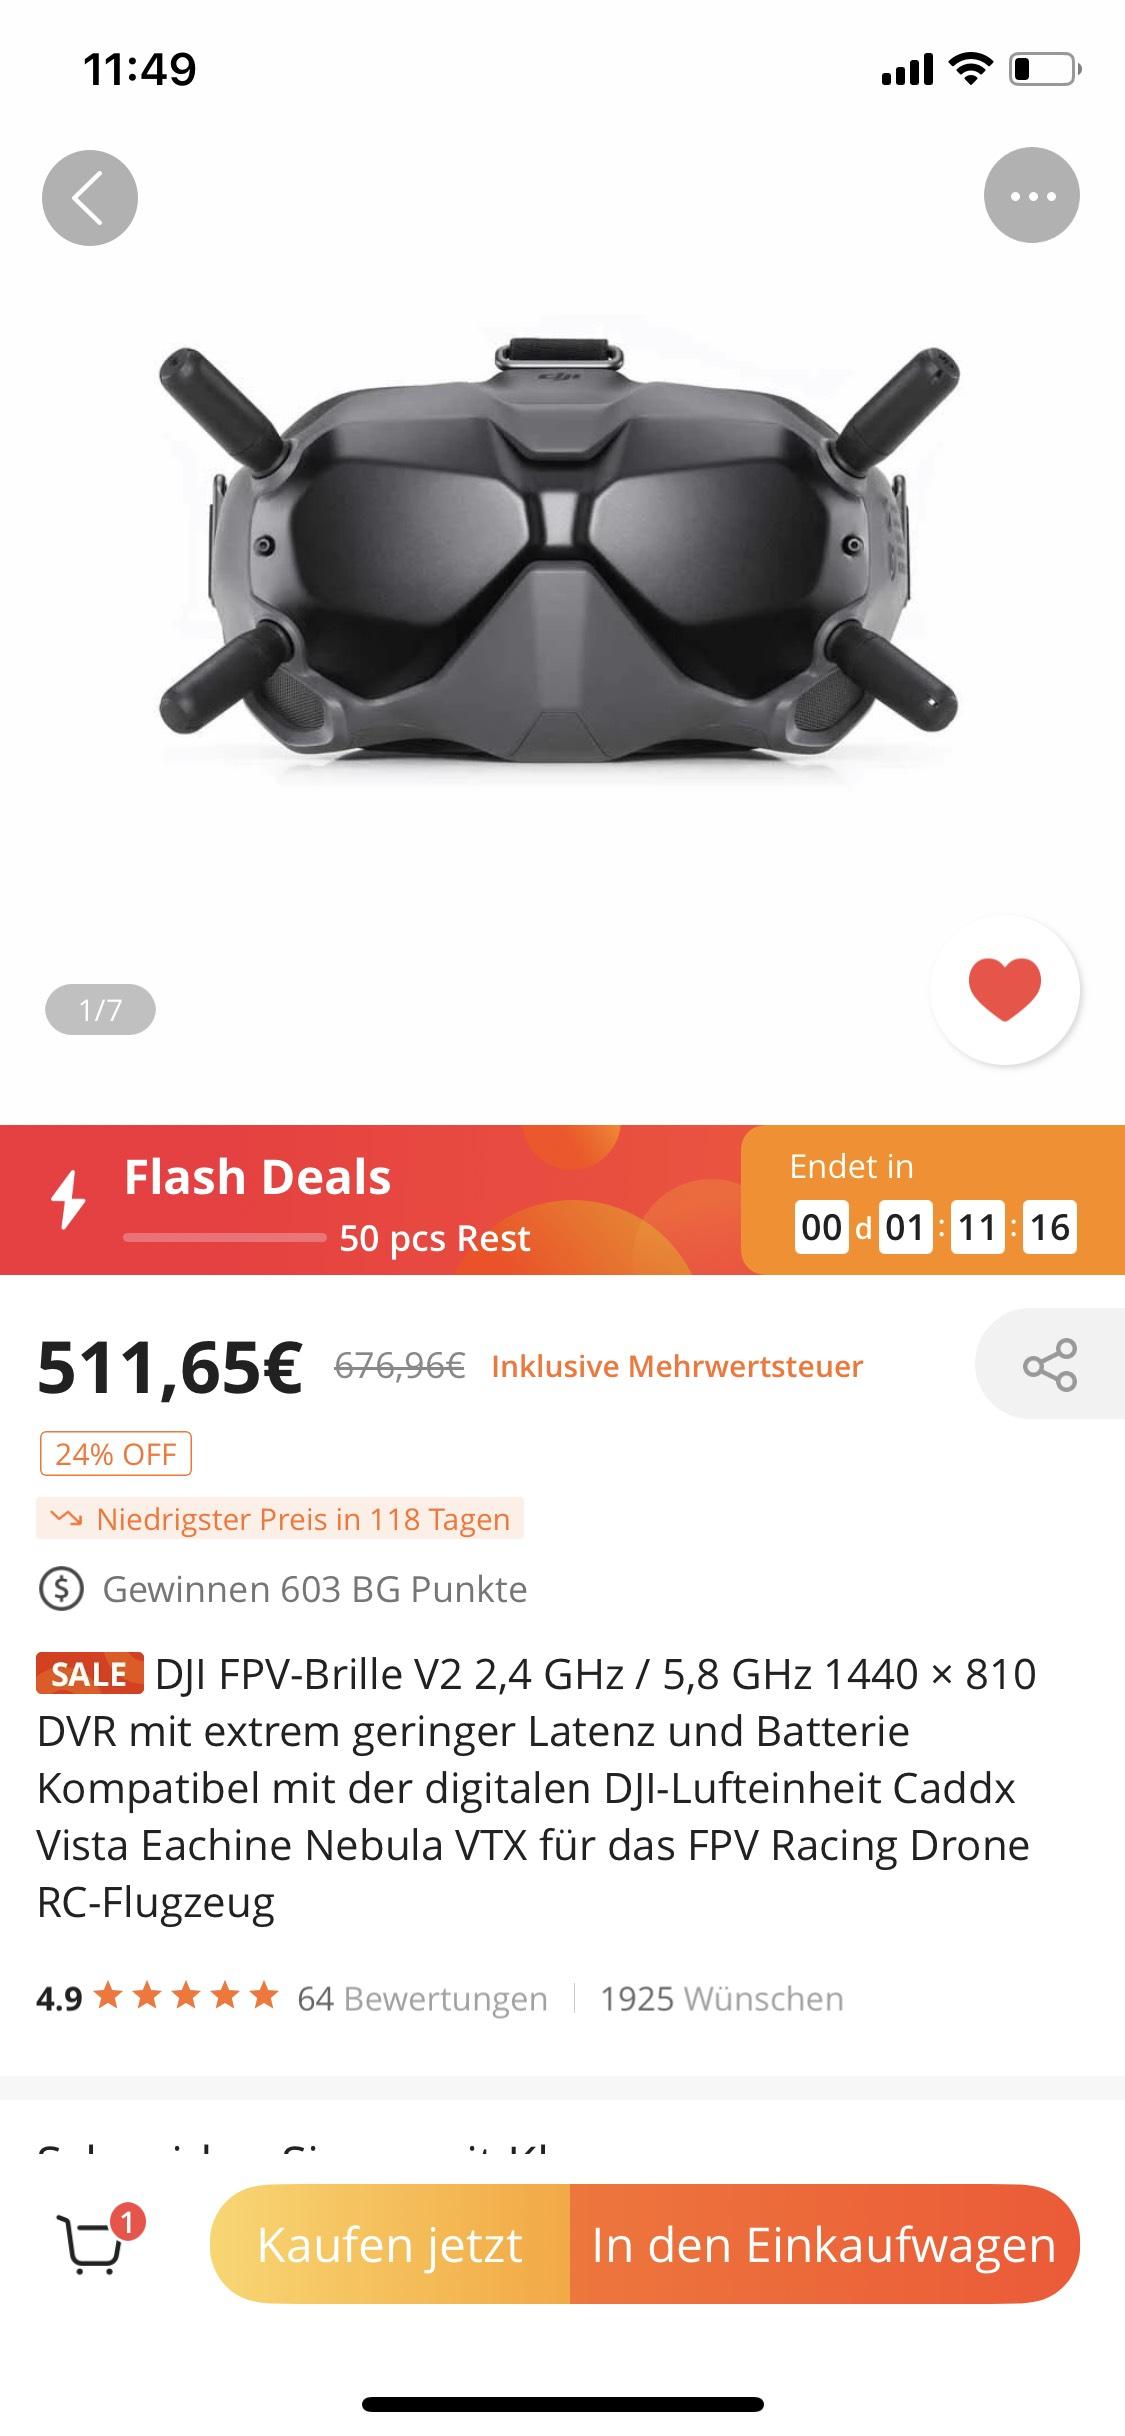 [BANGGOOD] DJI FPV Goggles V2 FPV-Brille